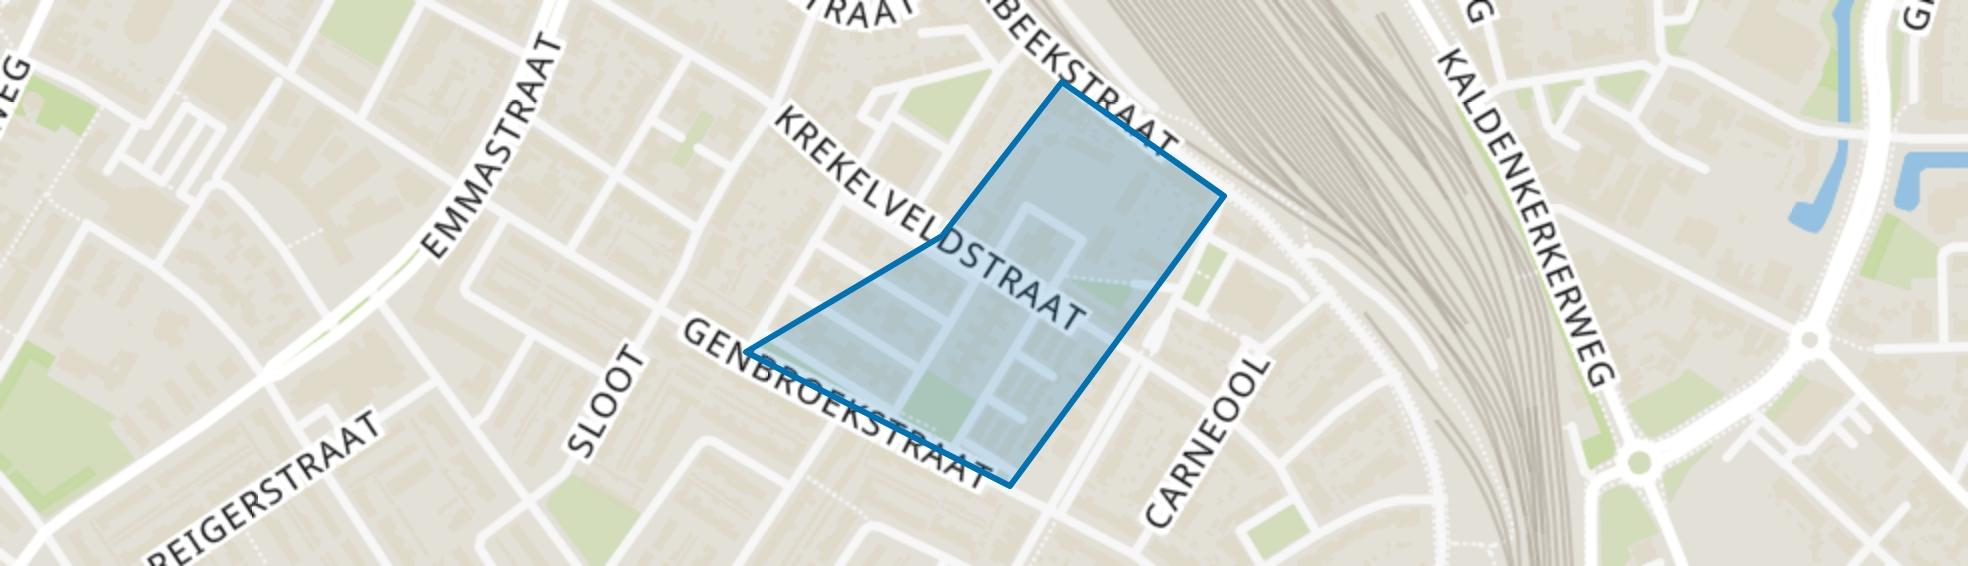 Krekelveld, Venlo map